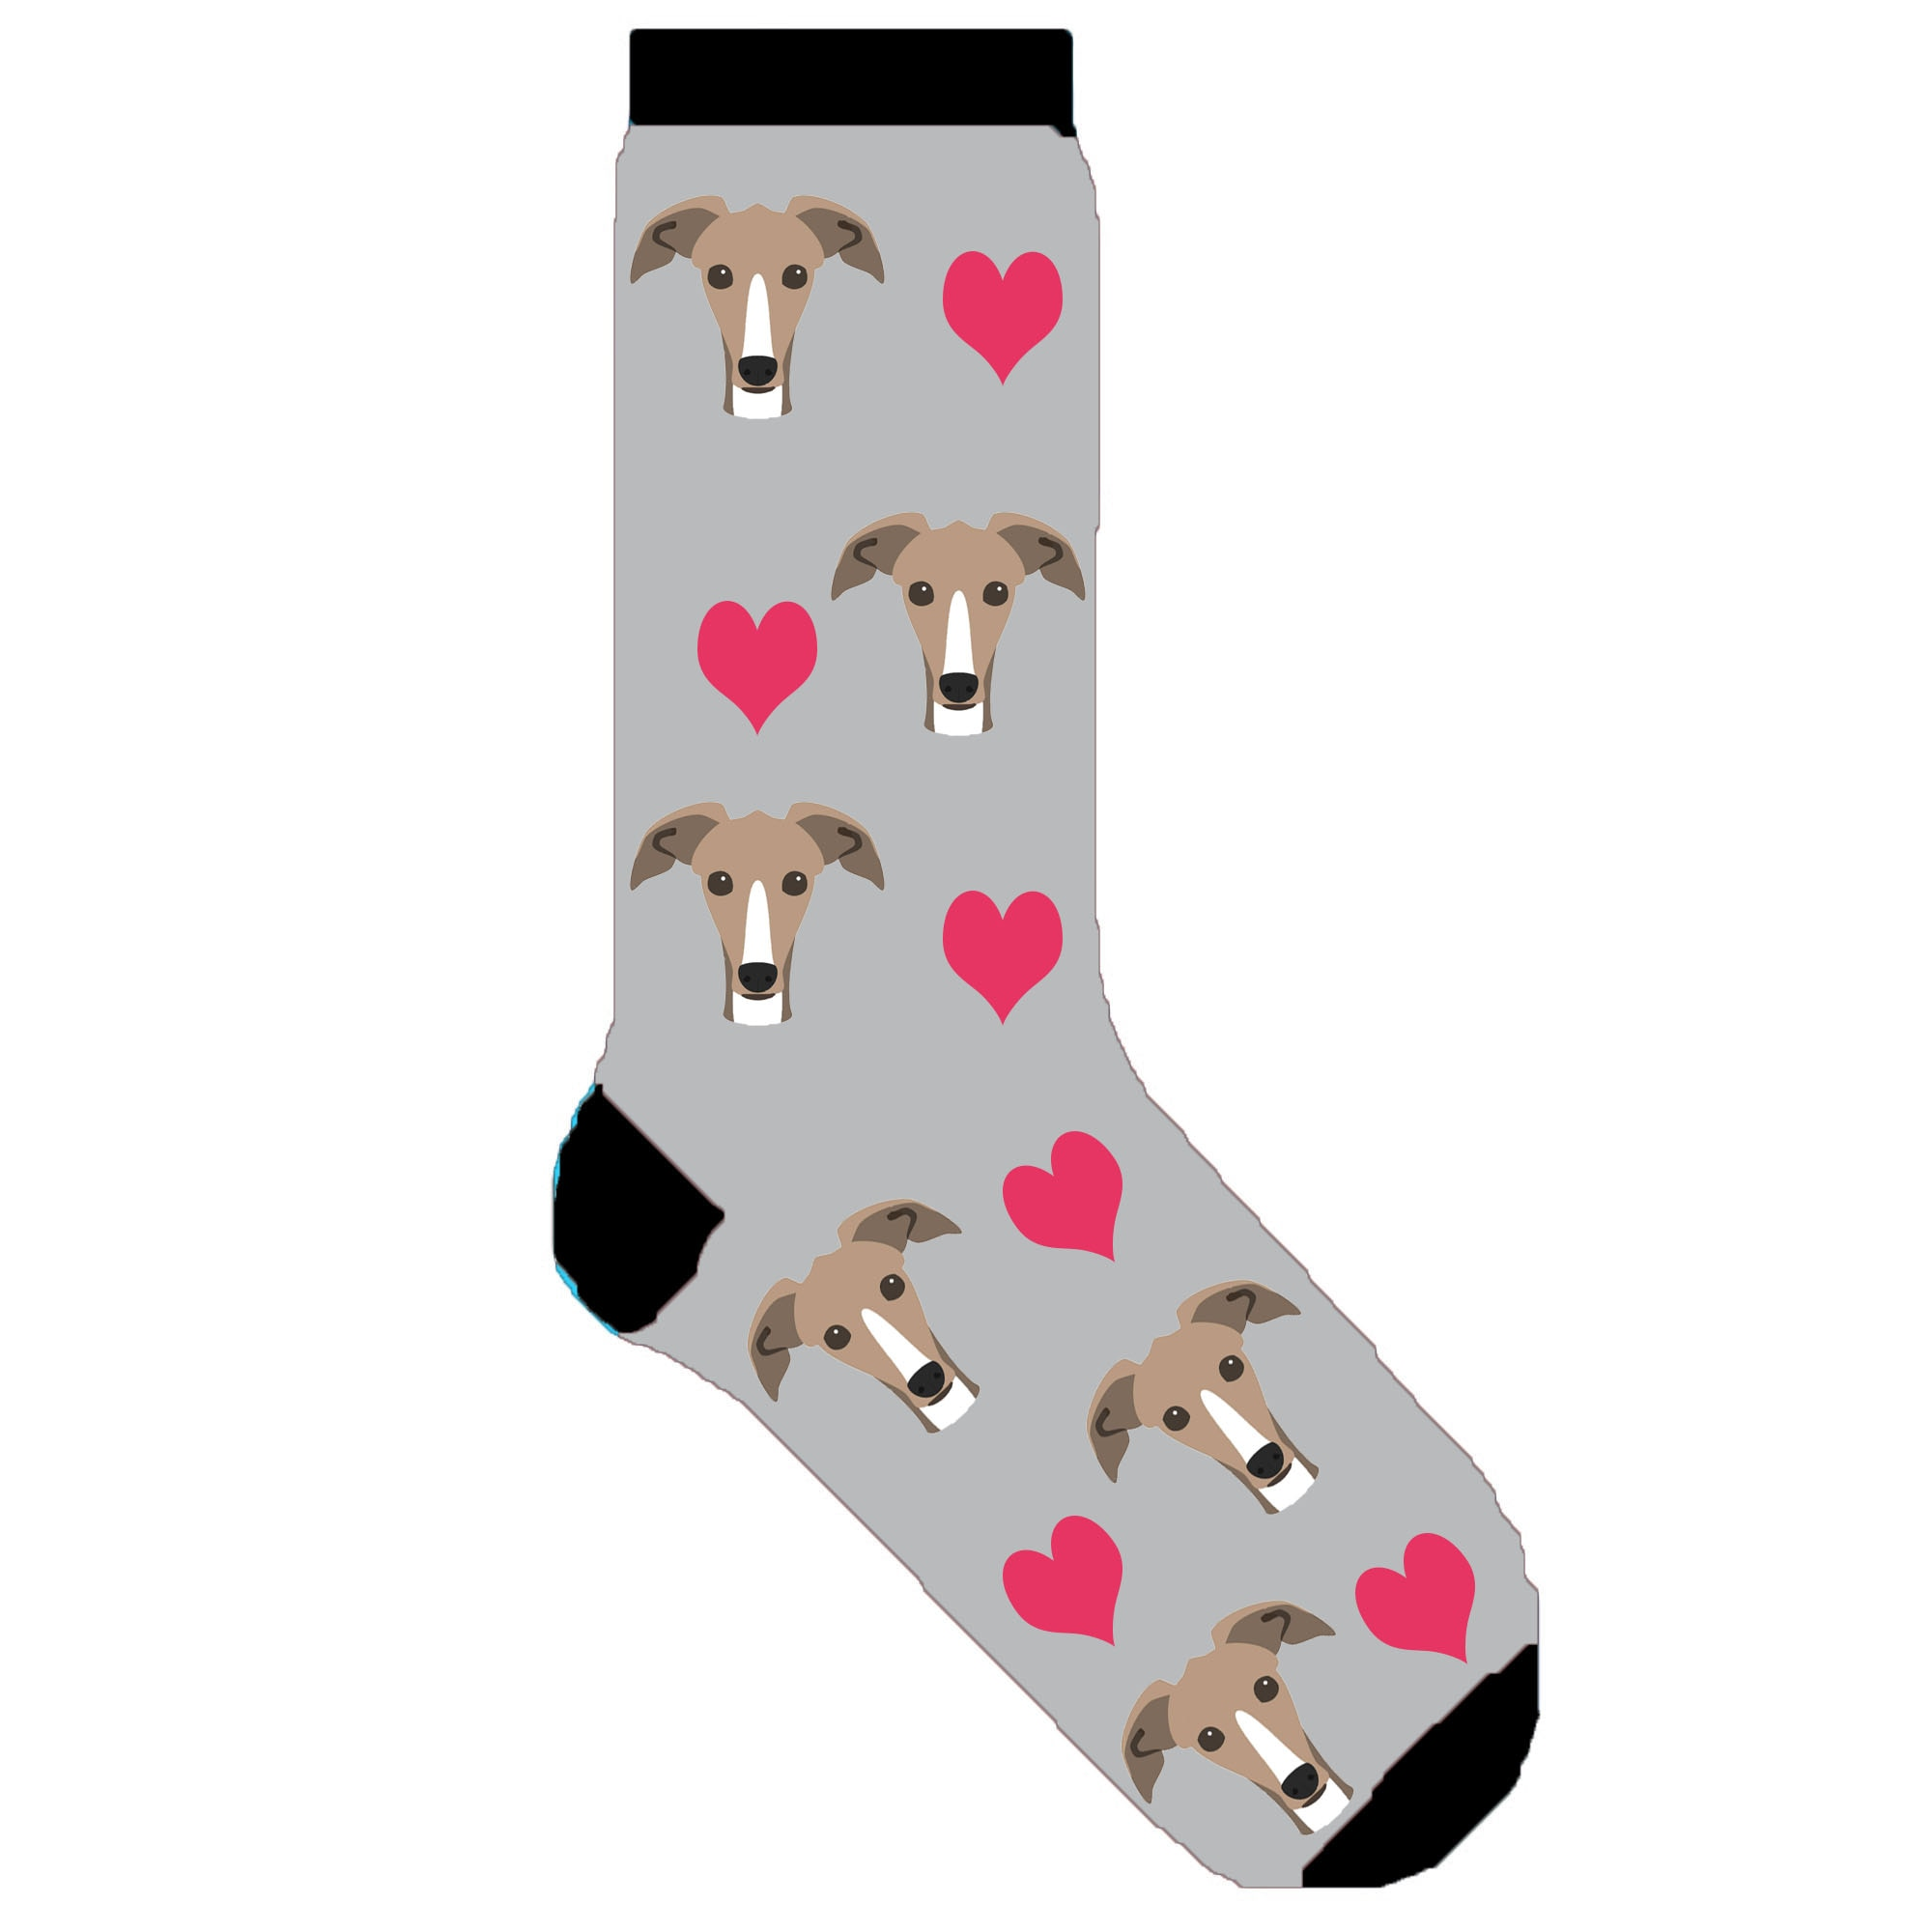 Whippet socks novelty GREYHOUND women dog socks fun greyhound puppy gift 50 pair/lot